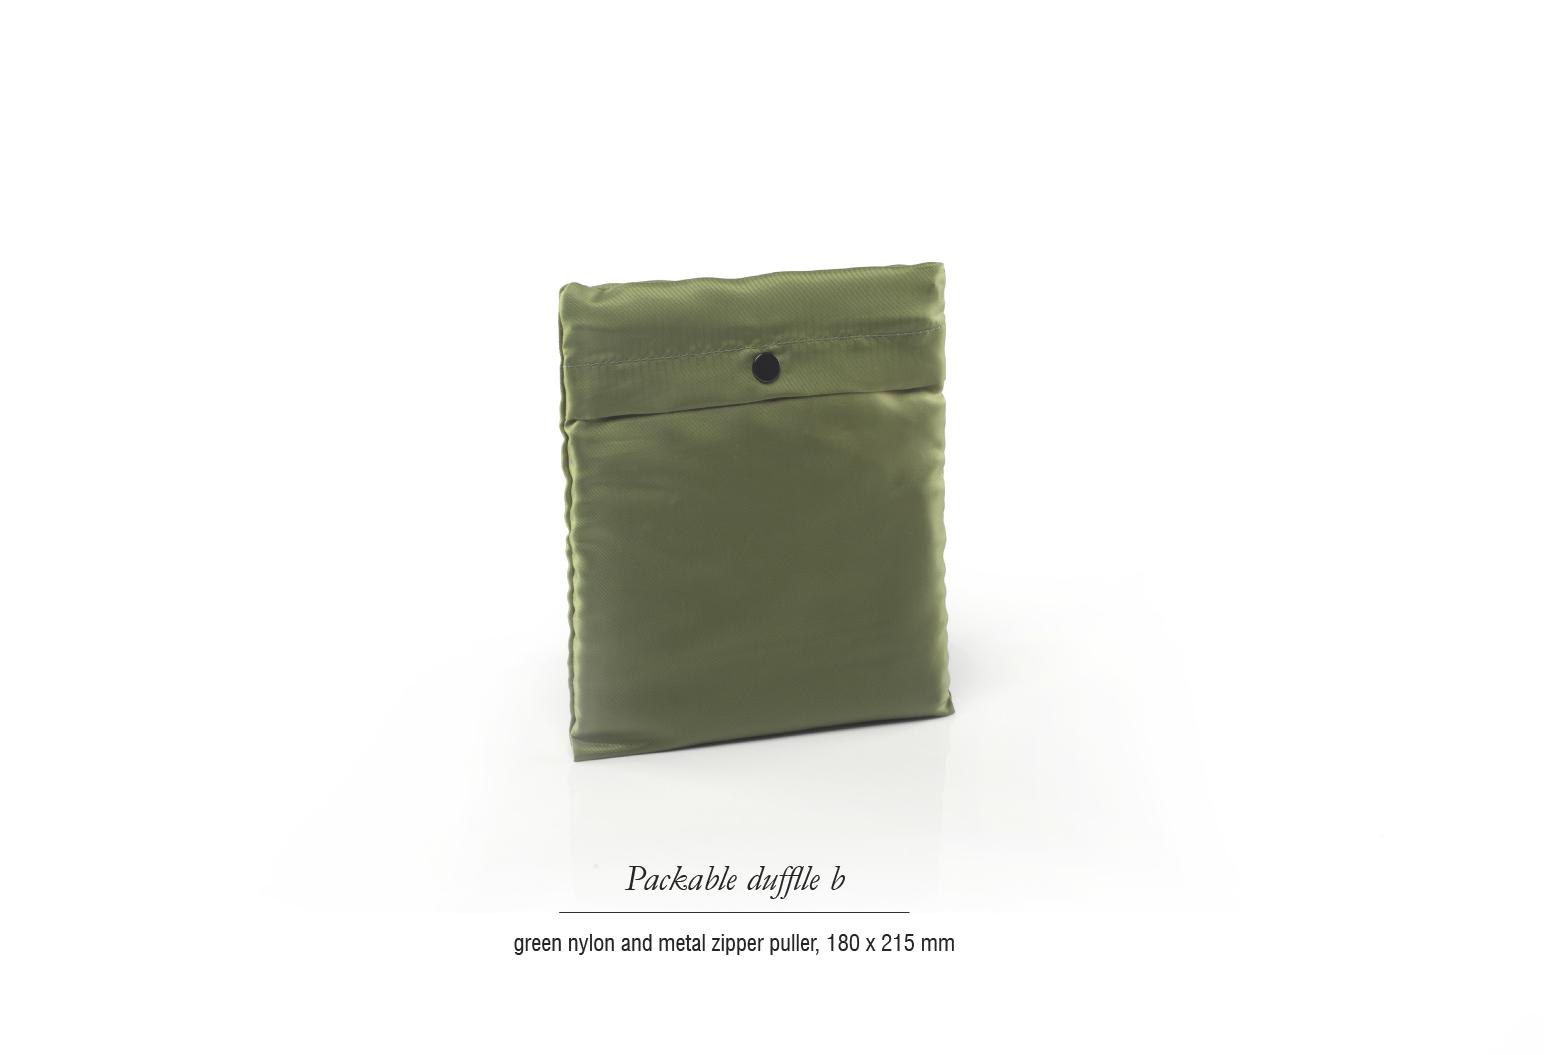 Amenity bags catalogue 2016_SHcollection_V6 101.jpg